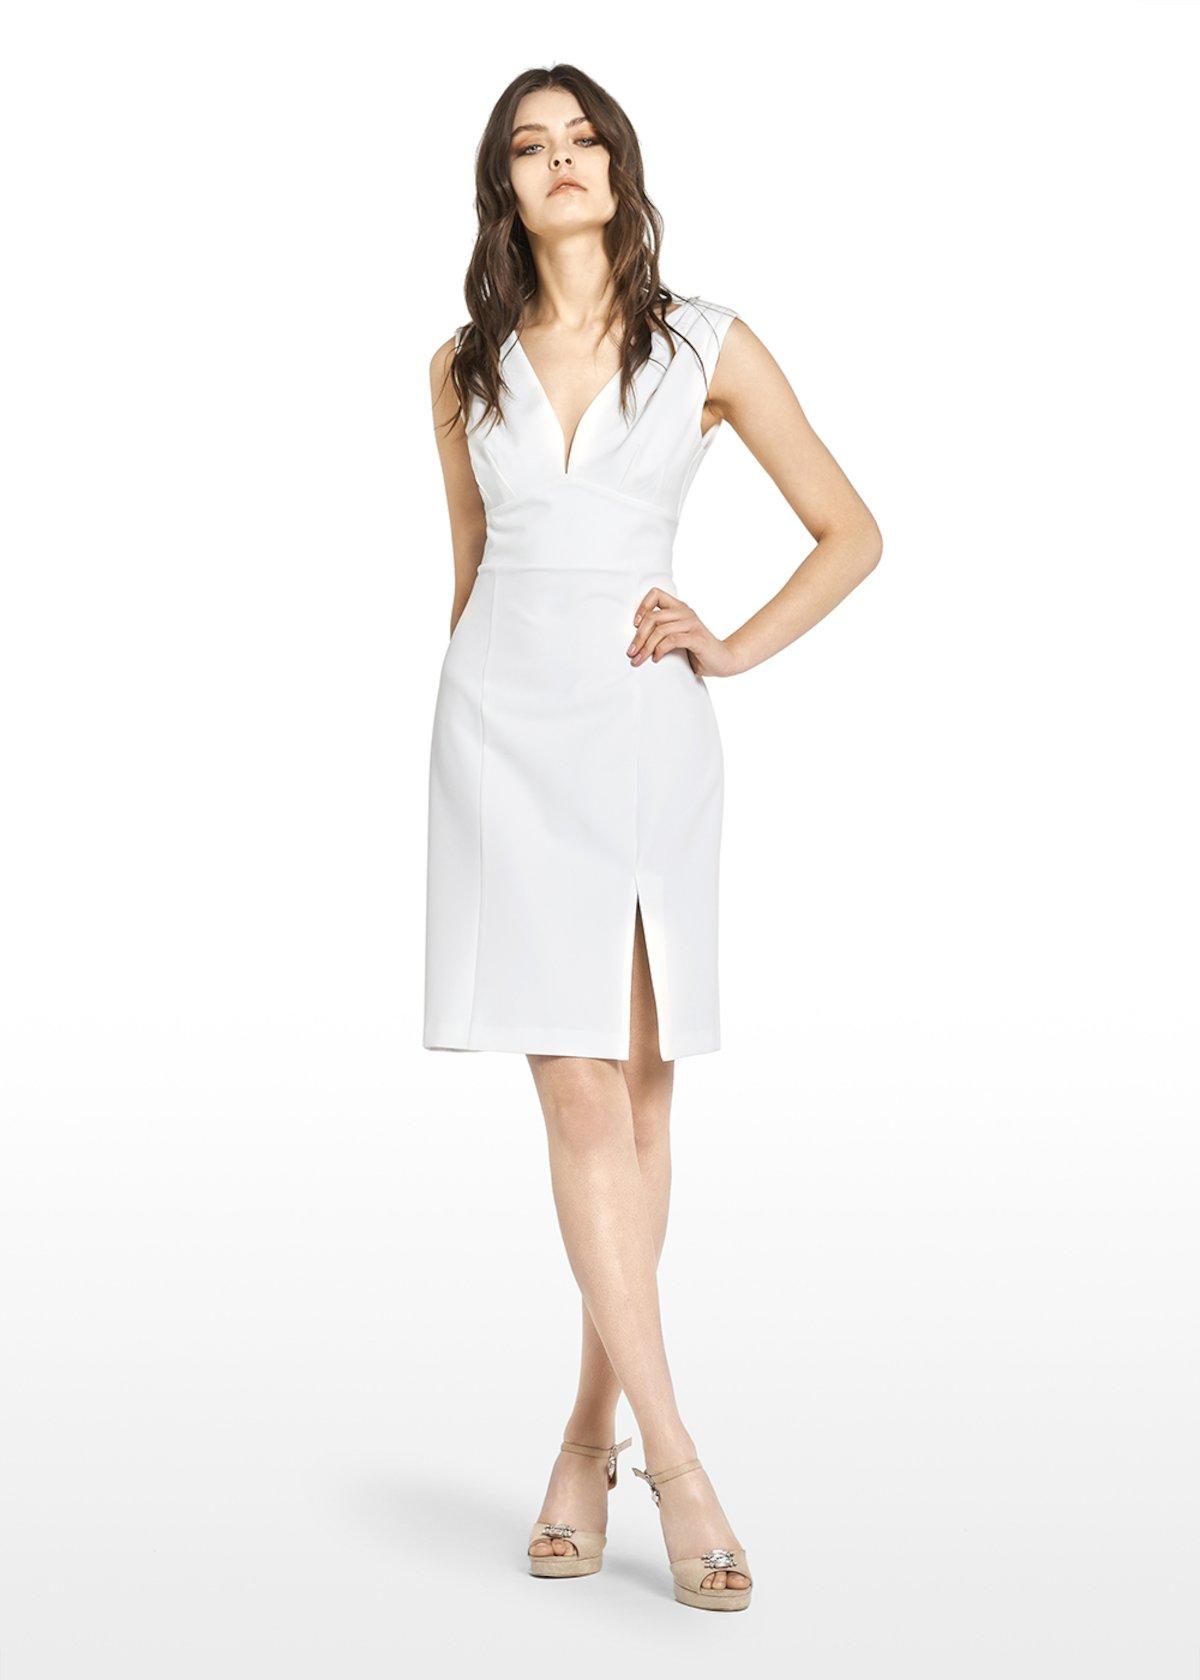 Athos sleeveless dress with V-neck - White - Woman - Category image